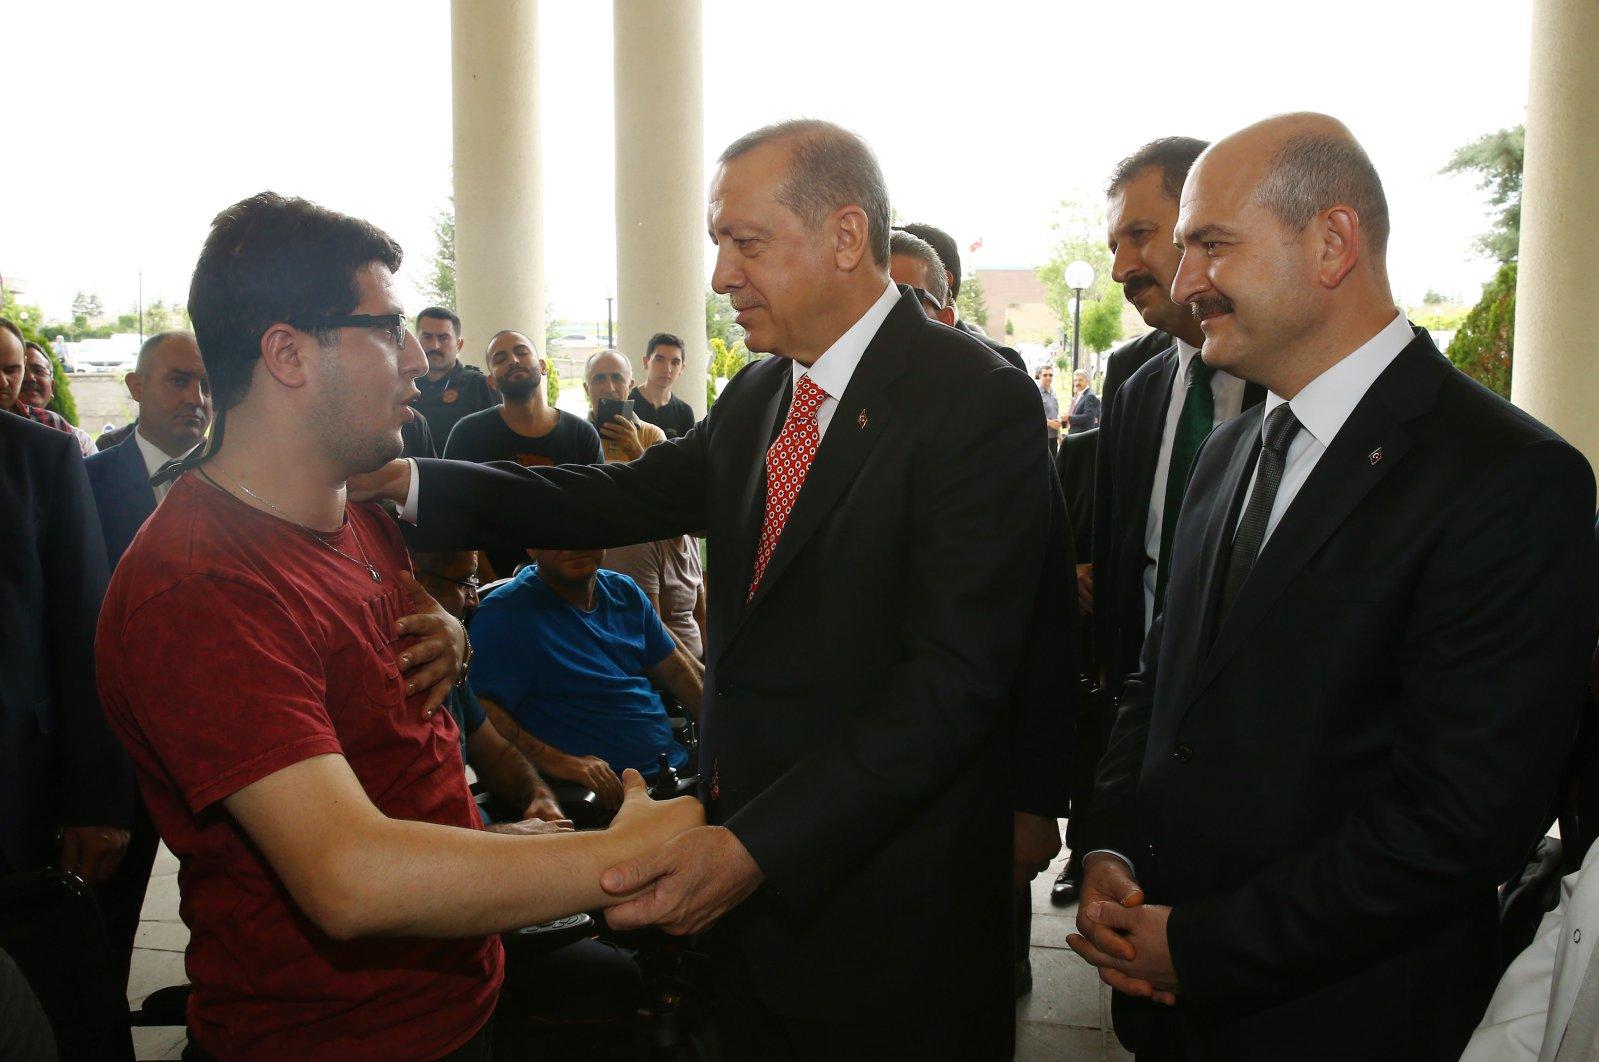 President Recep Tayyip Erdoğan (C) and Interior Minister Süleyman Soylu (R) visit wounded veterans at a rehabilitation hospital in Ankara, Turkey, July 5, 2017. (Sabah Photo via the Presidential Complex)